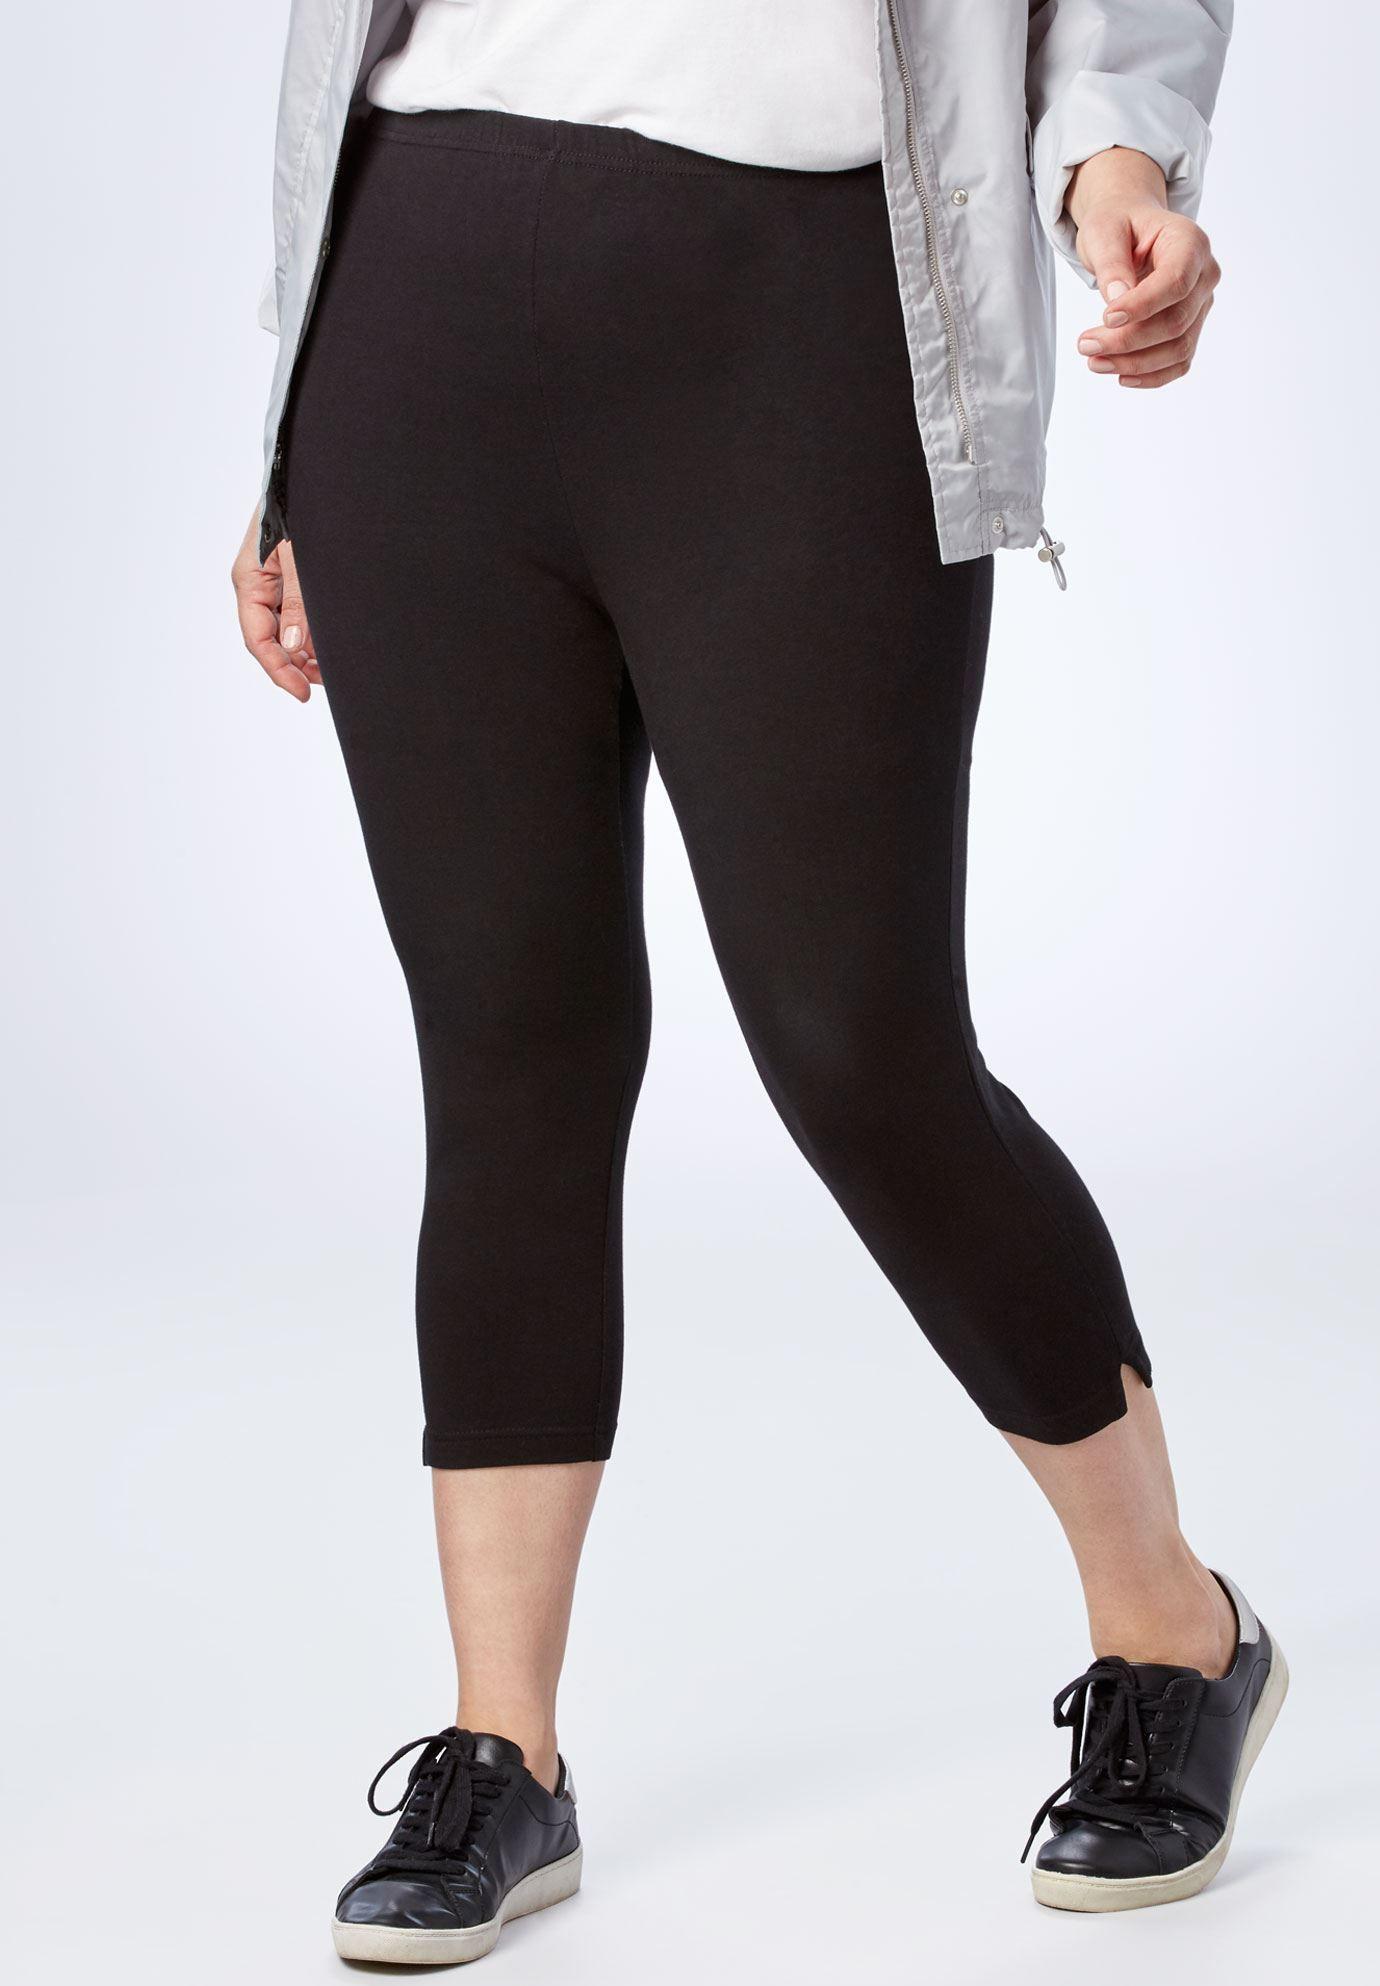 Dcc stretch womens petite clothing 7